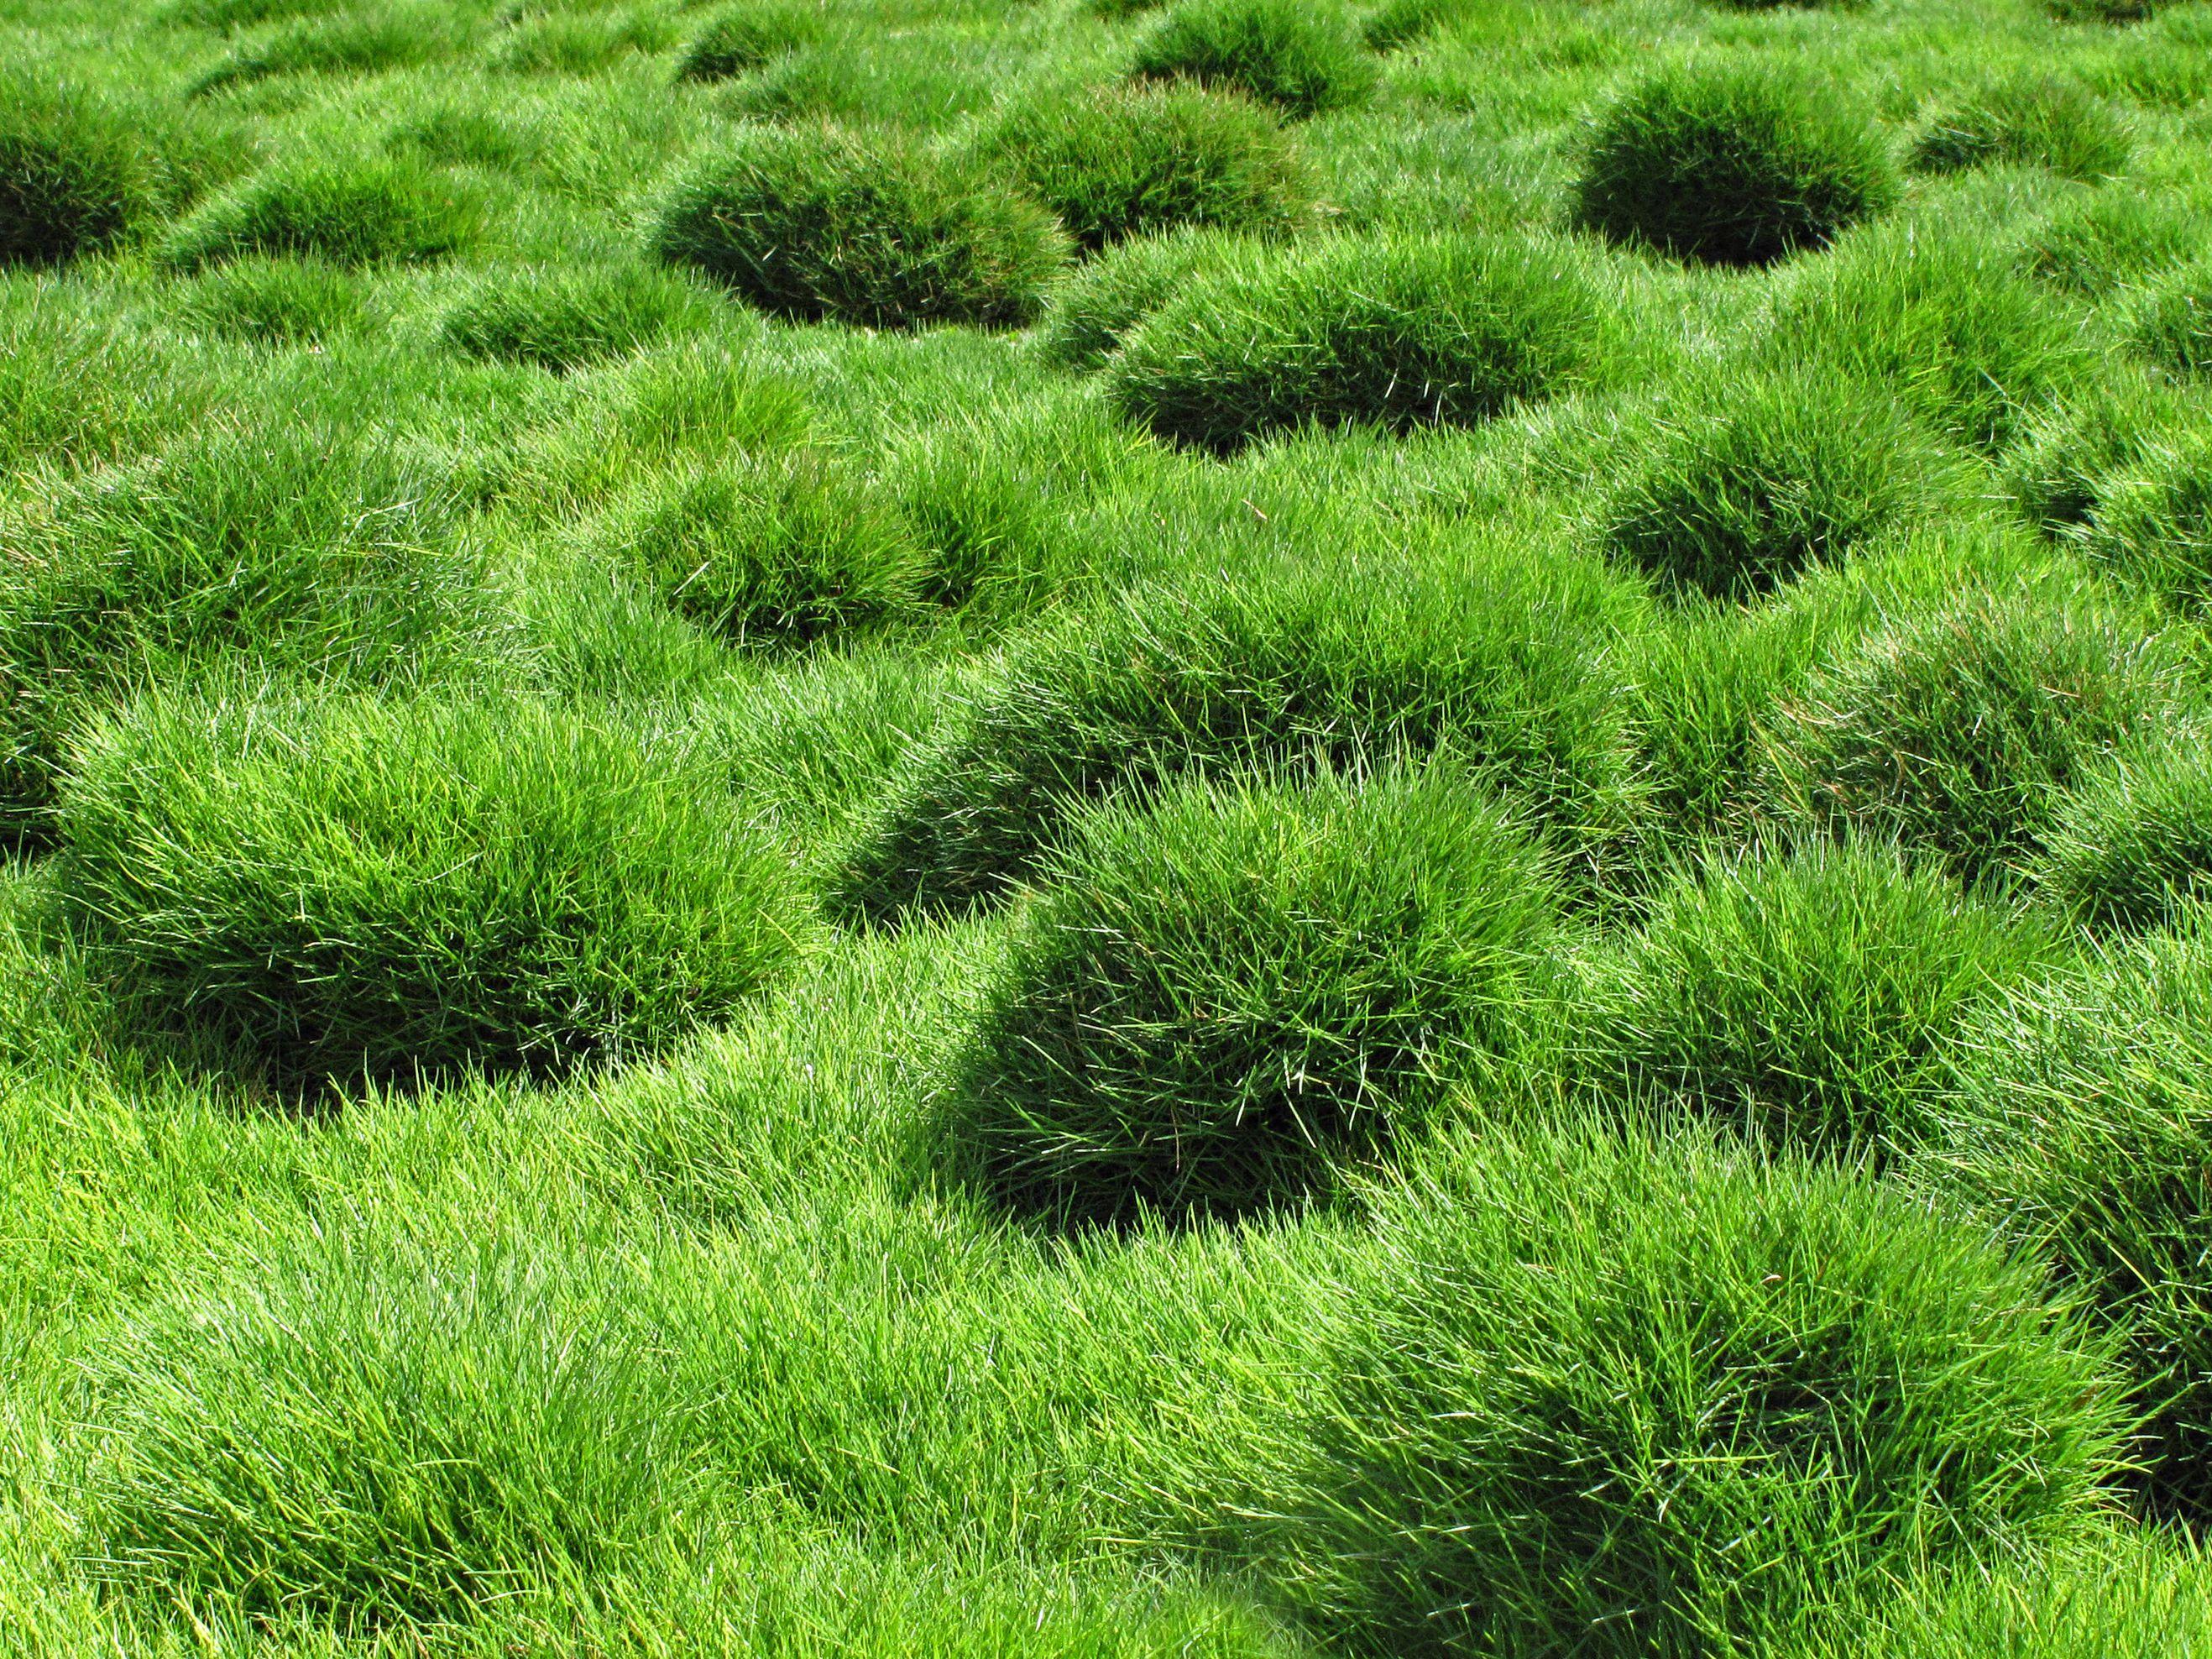 6 Grasses For Low Maintenance Drought Resistant Lawns